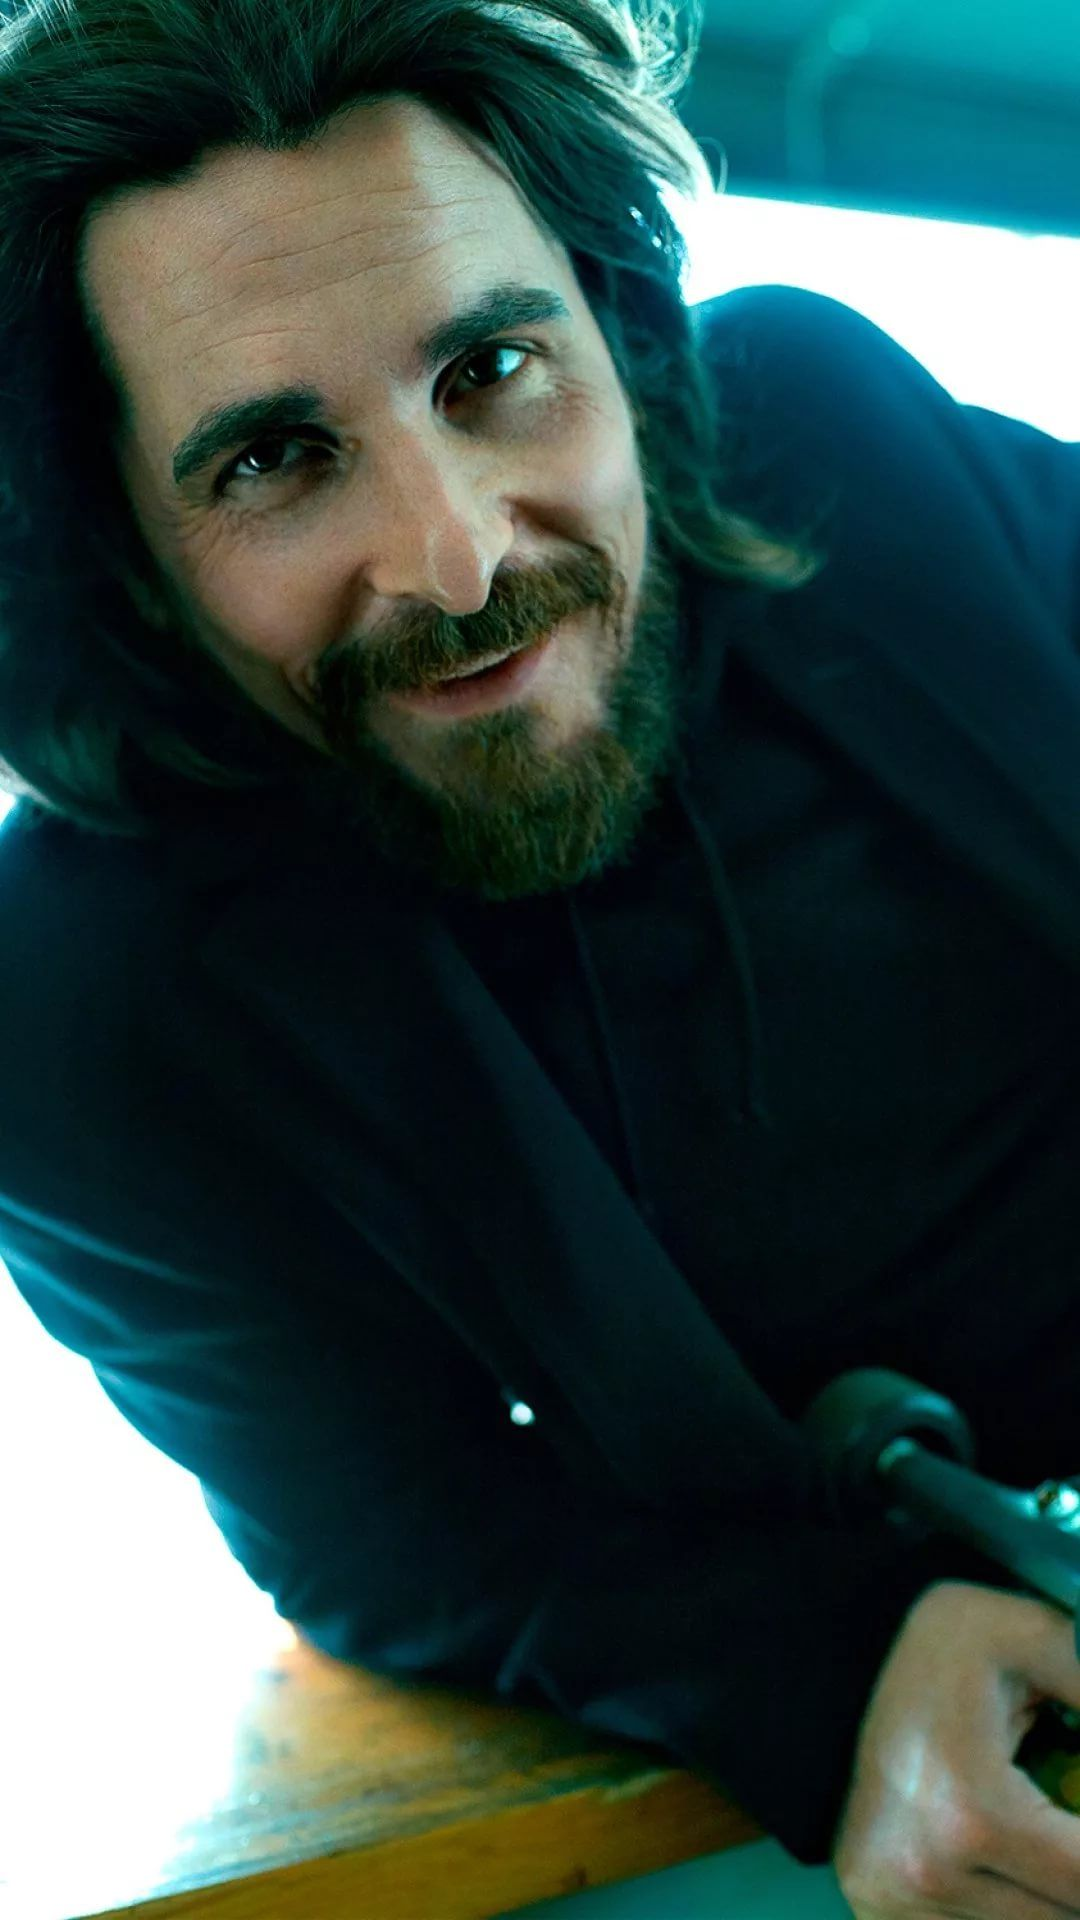 Christian Bale hd wallpaper